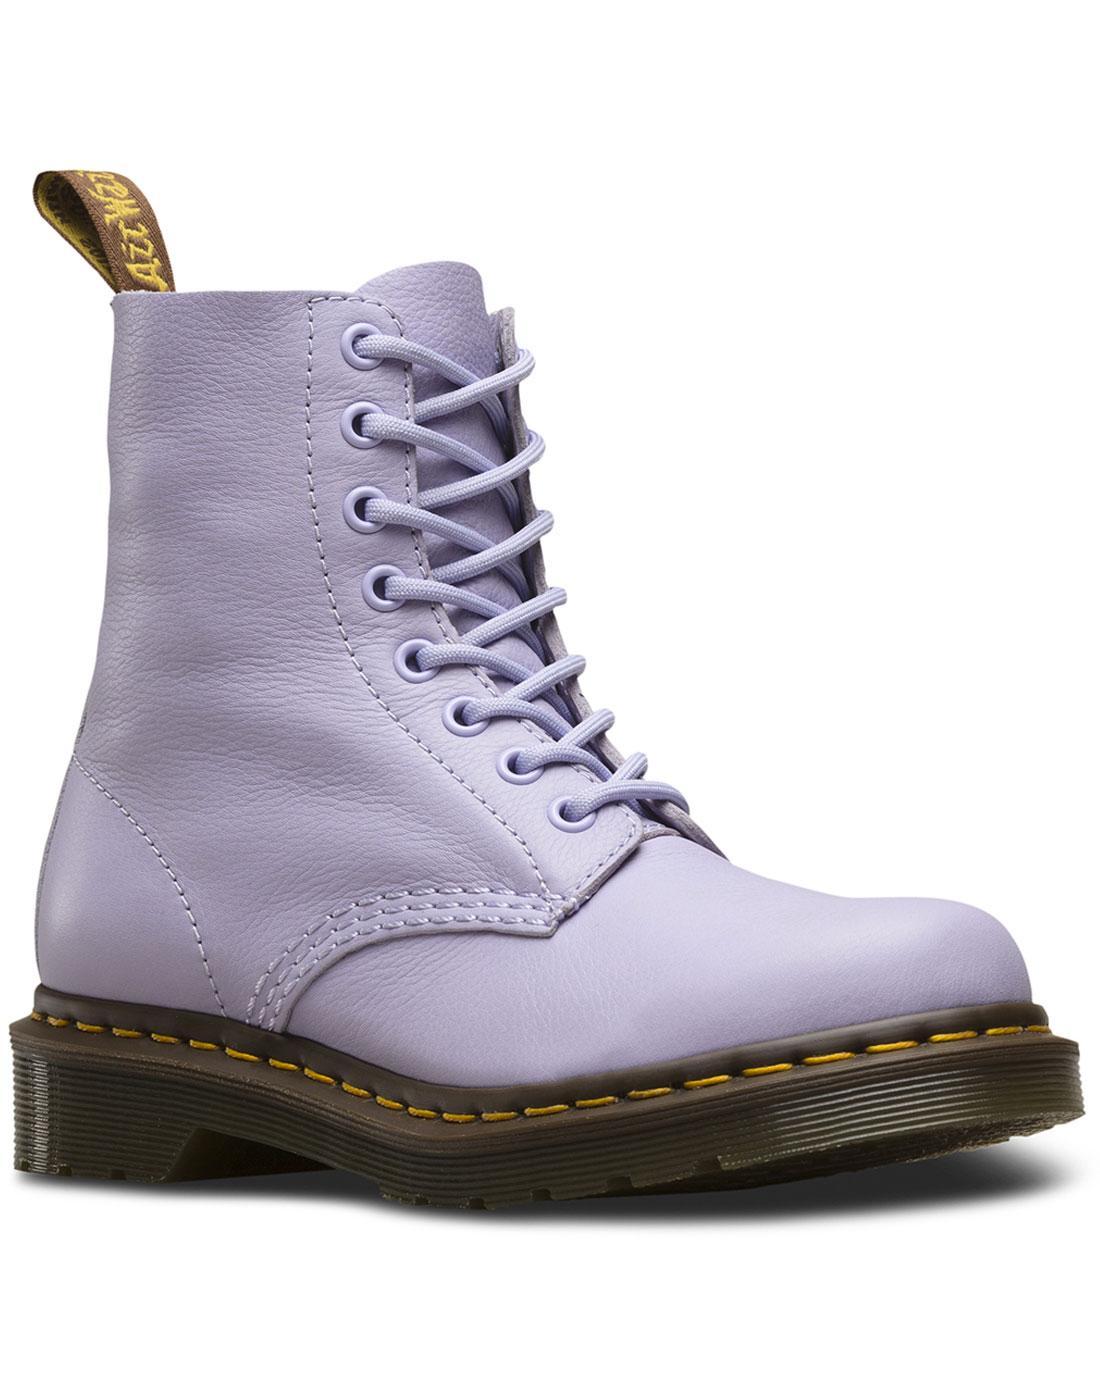 1460 Pascal DR MARTENS Retro Purple Heather Boots